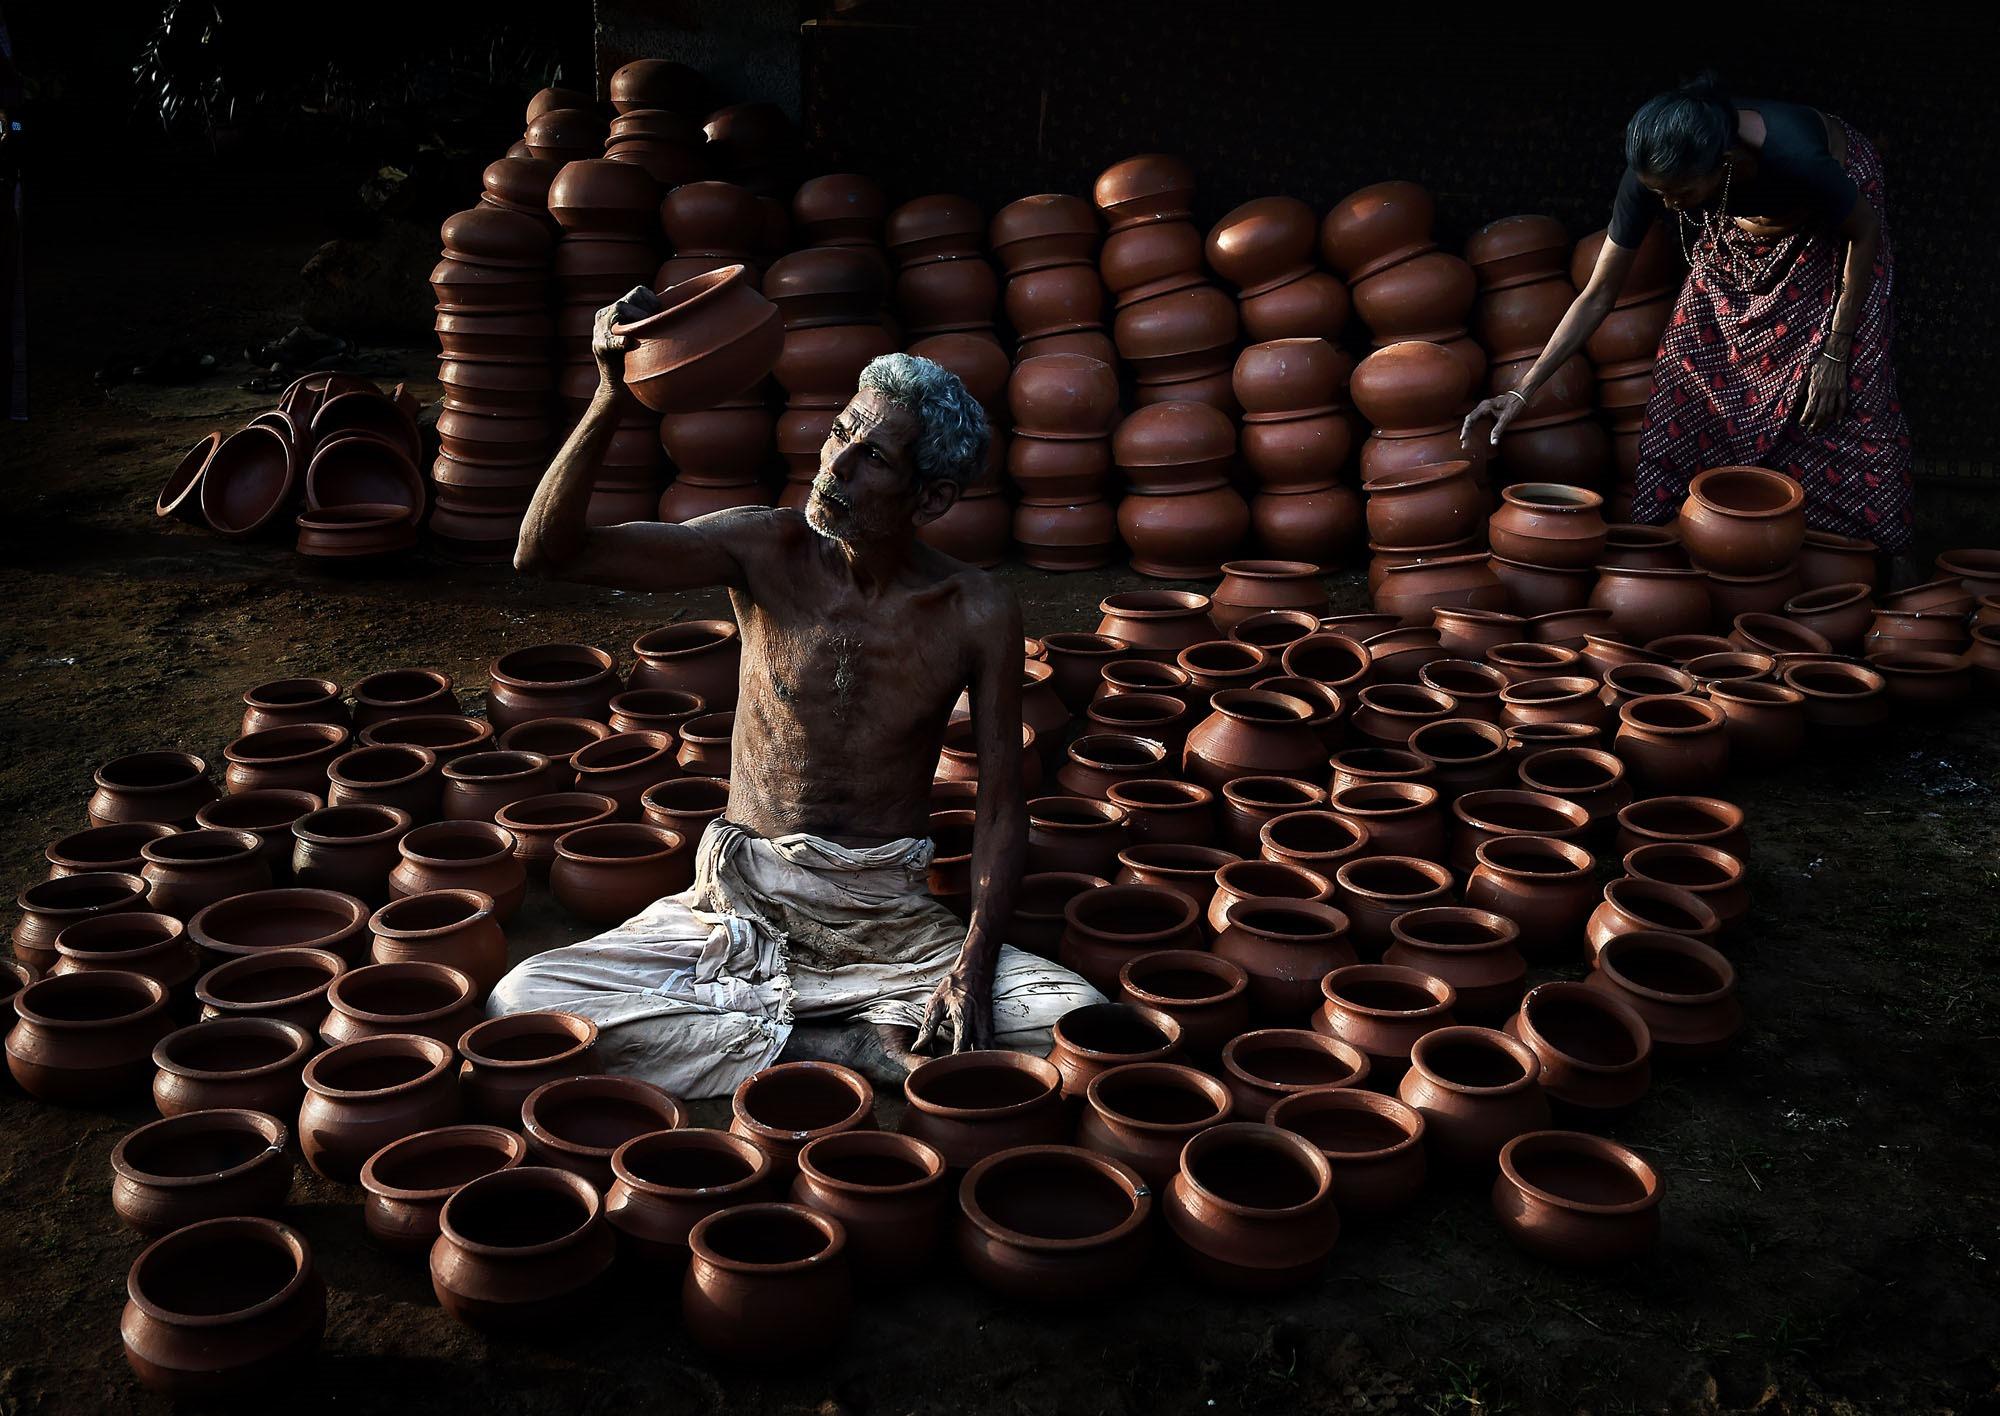 264330_© Firos Syed, Winner, Qatar National Award, Culture, 2017 Sony World Photography Awards